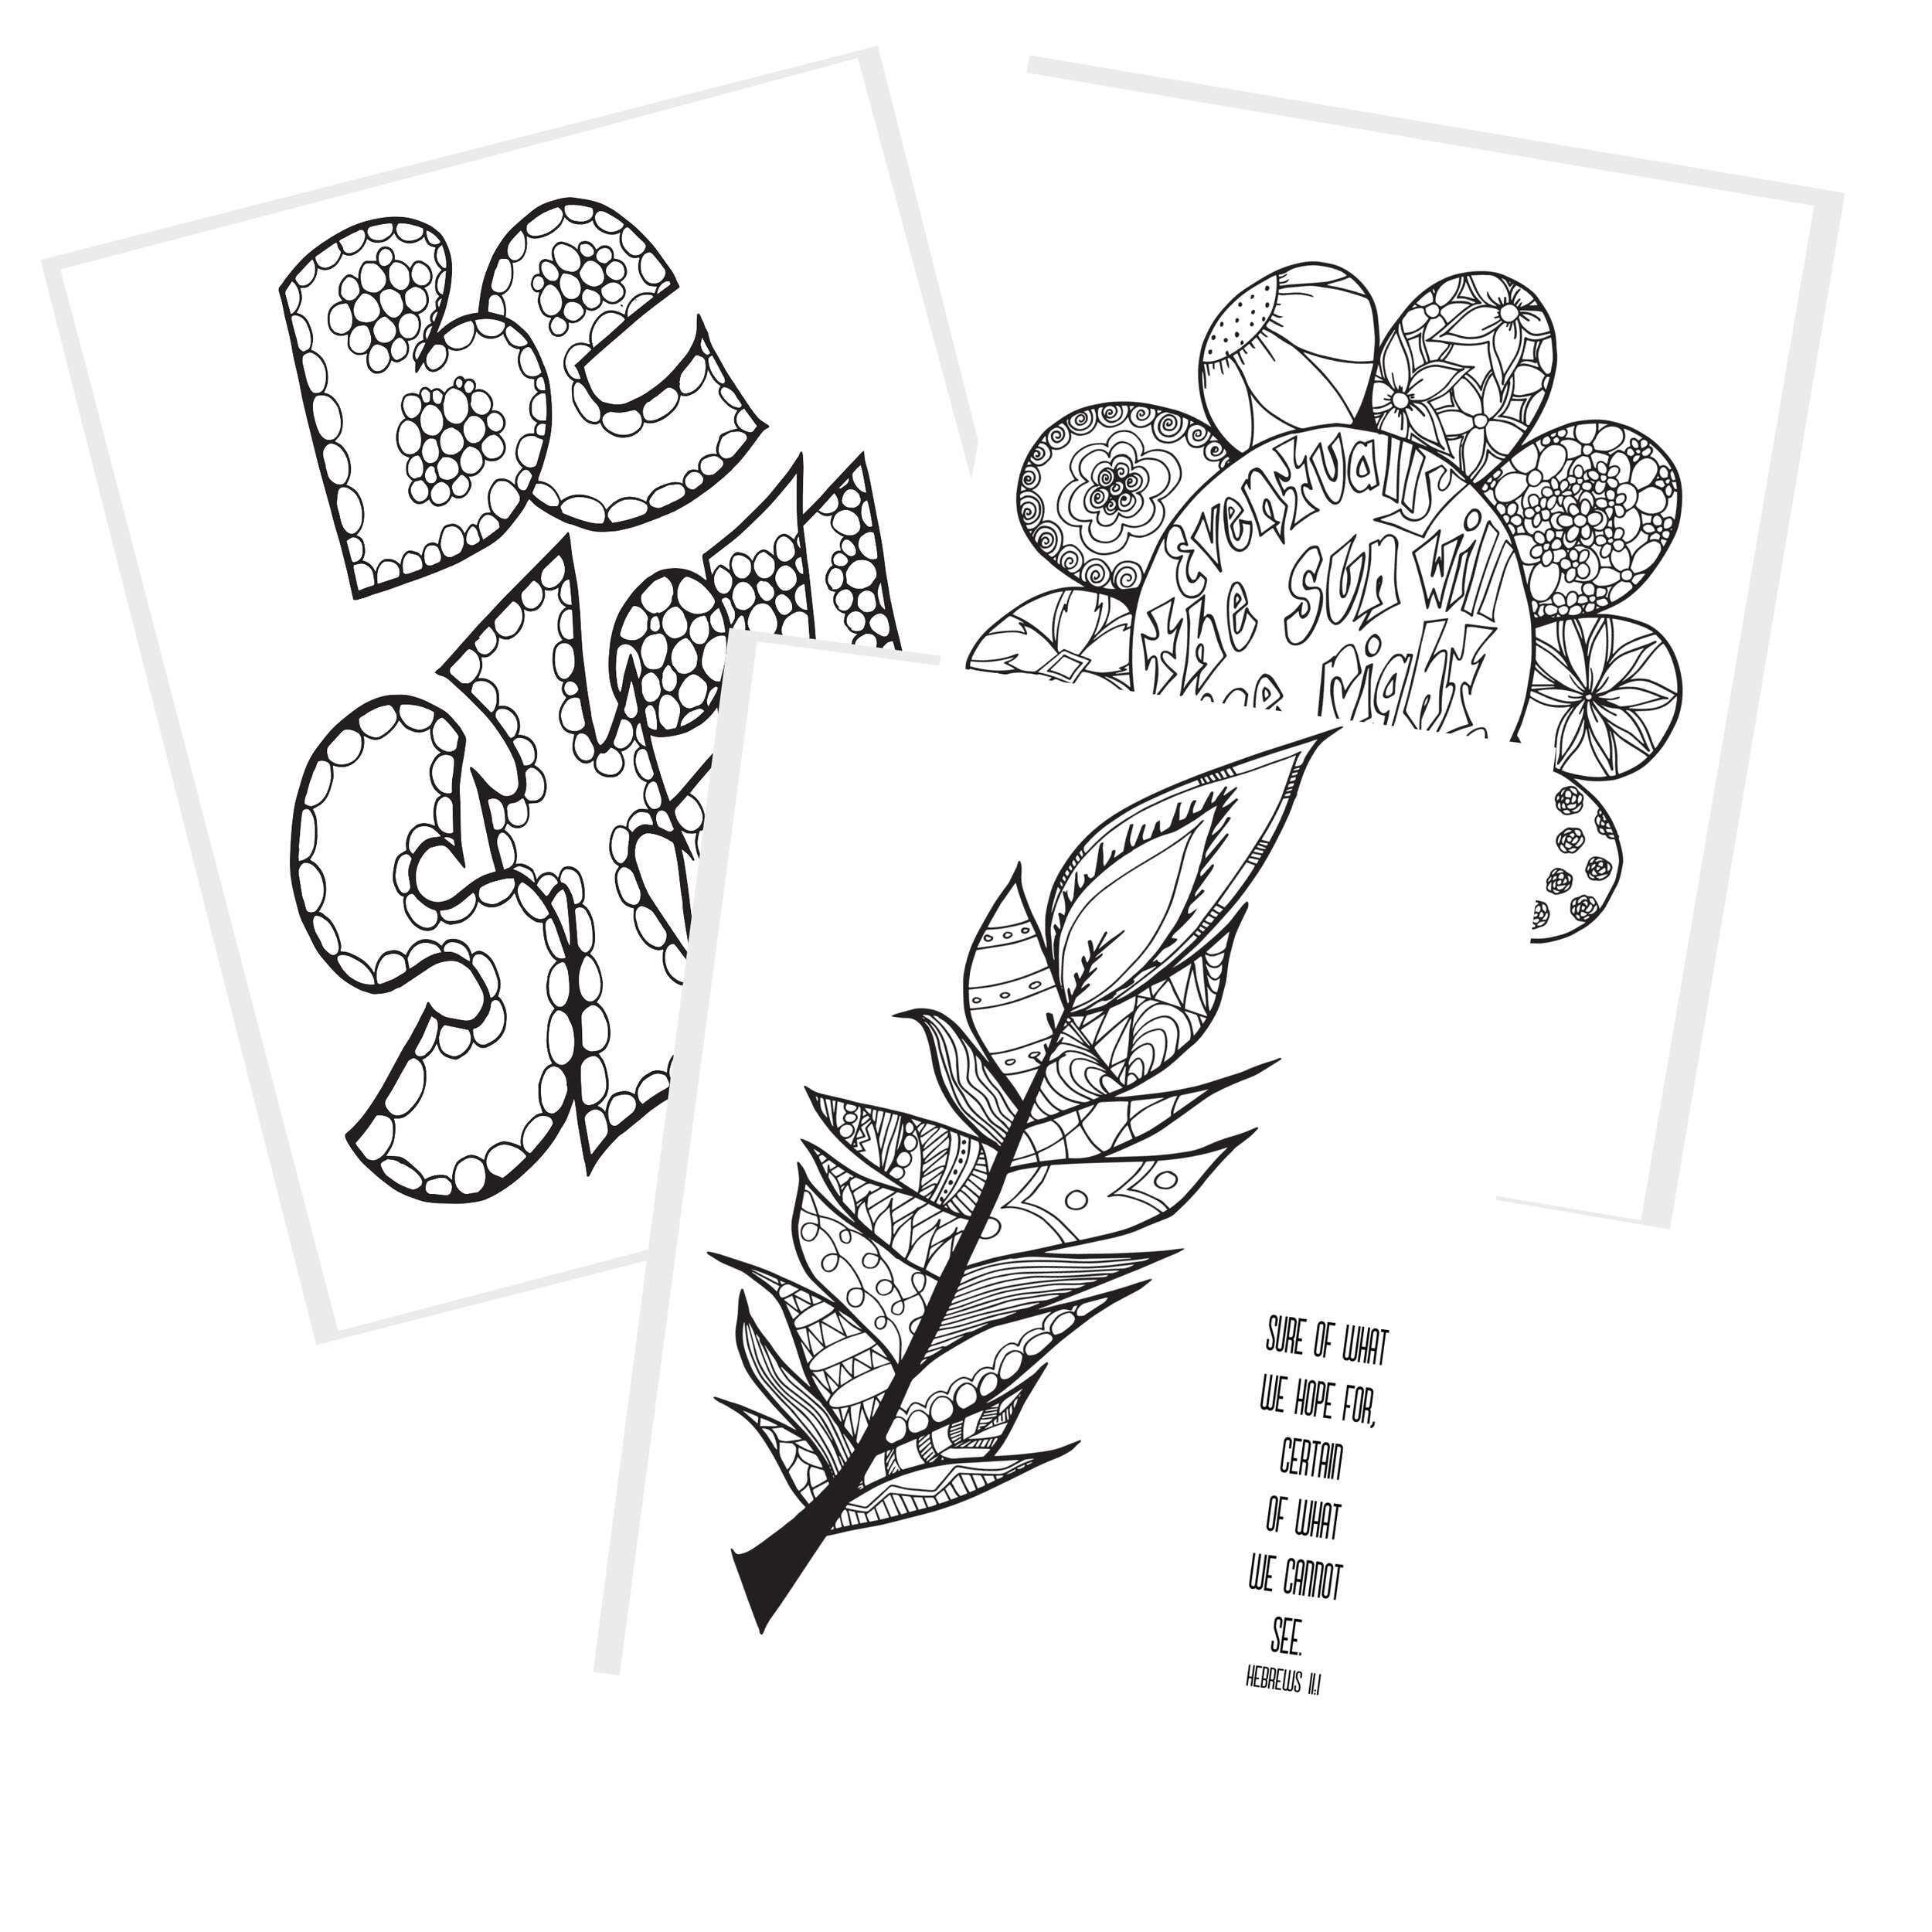 Capturing Thoughts Coloring Book Mockup 4.jpg